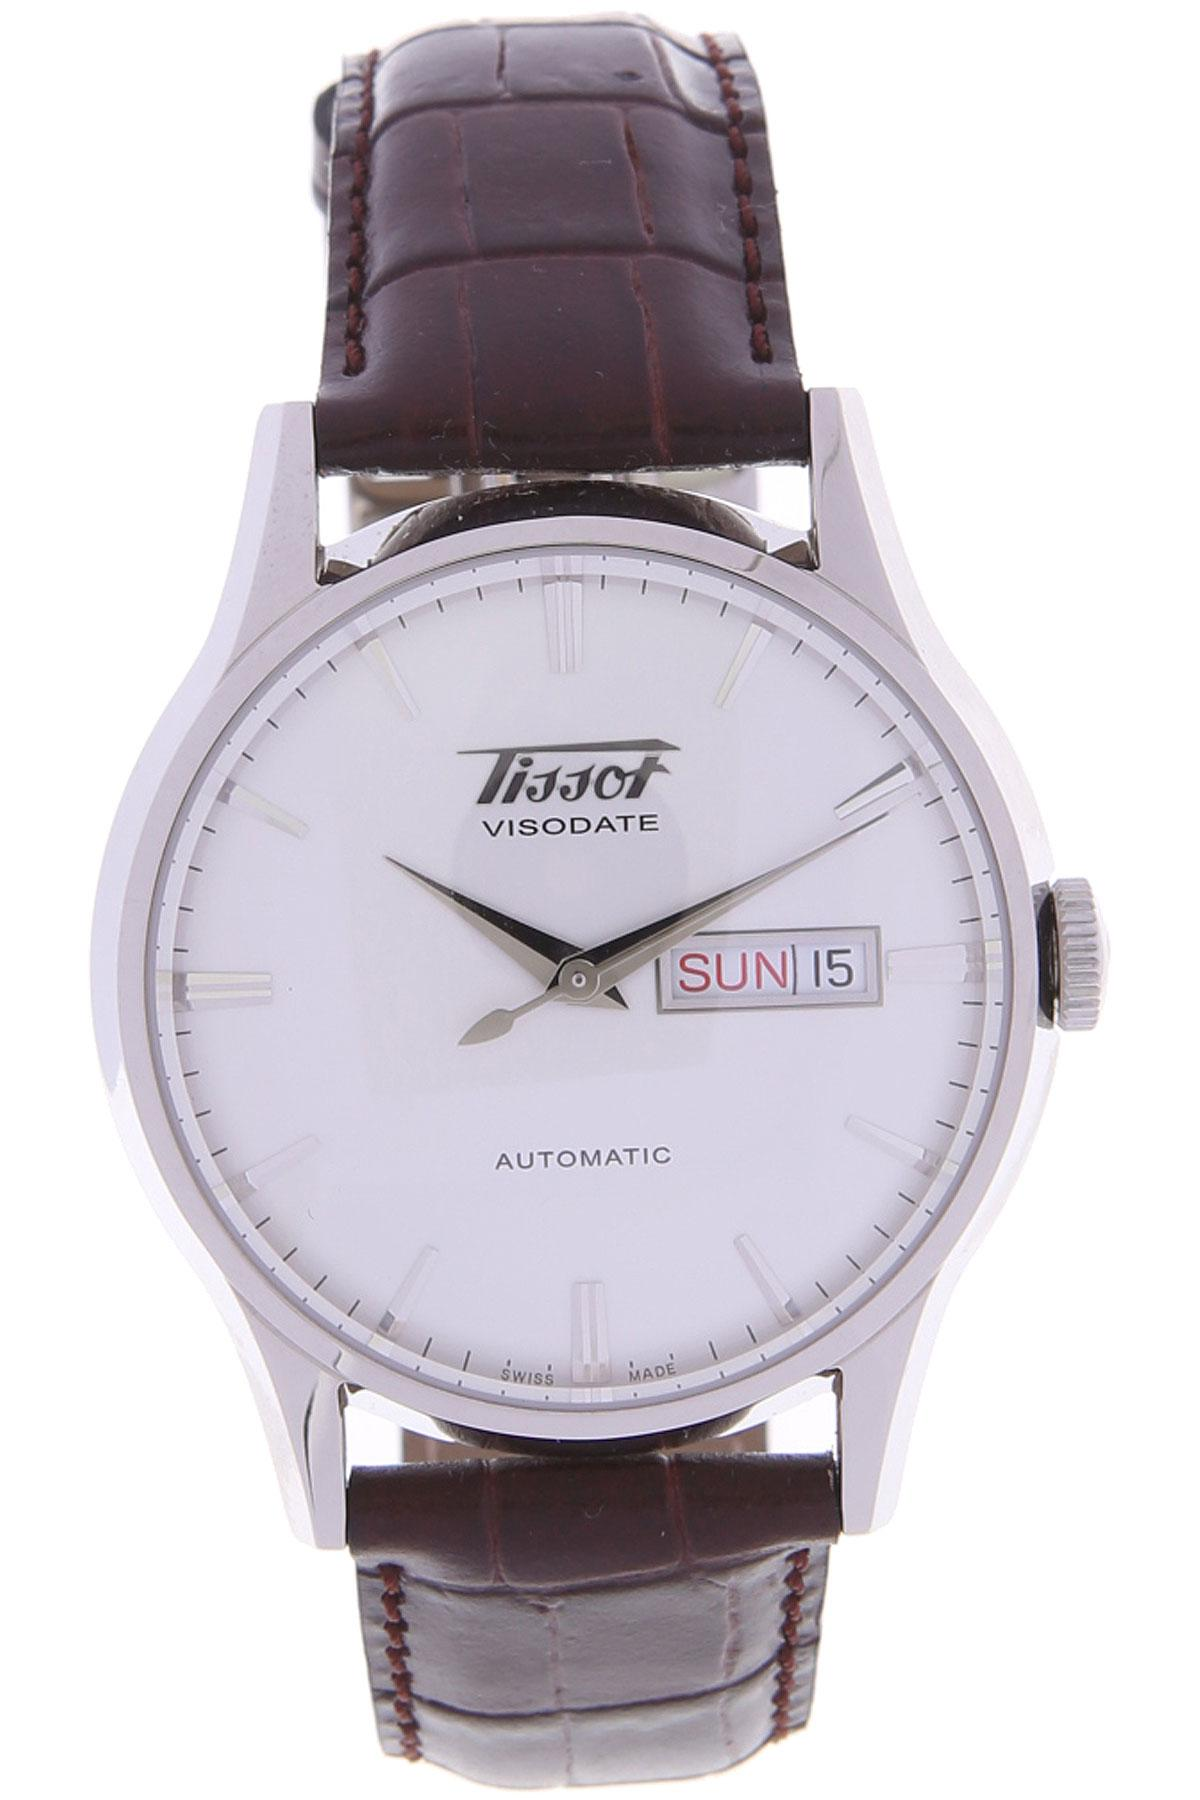 d7709c6dce41 Reloj para Hombre Baratos en Rebajas Tissot de hombre de color ...